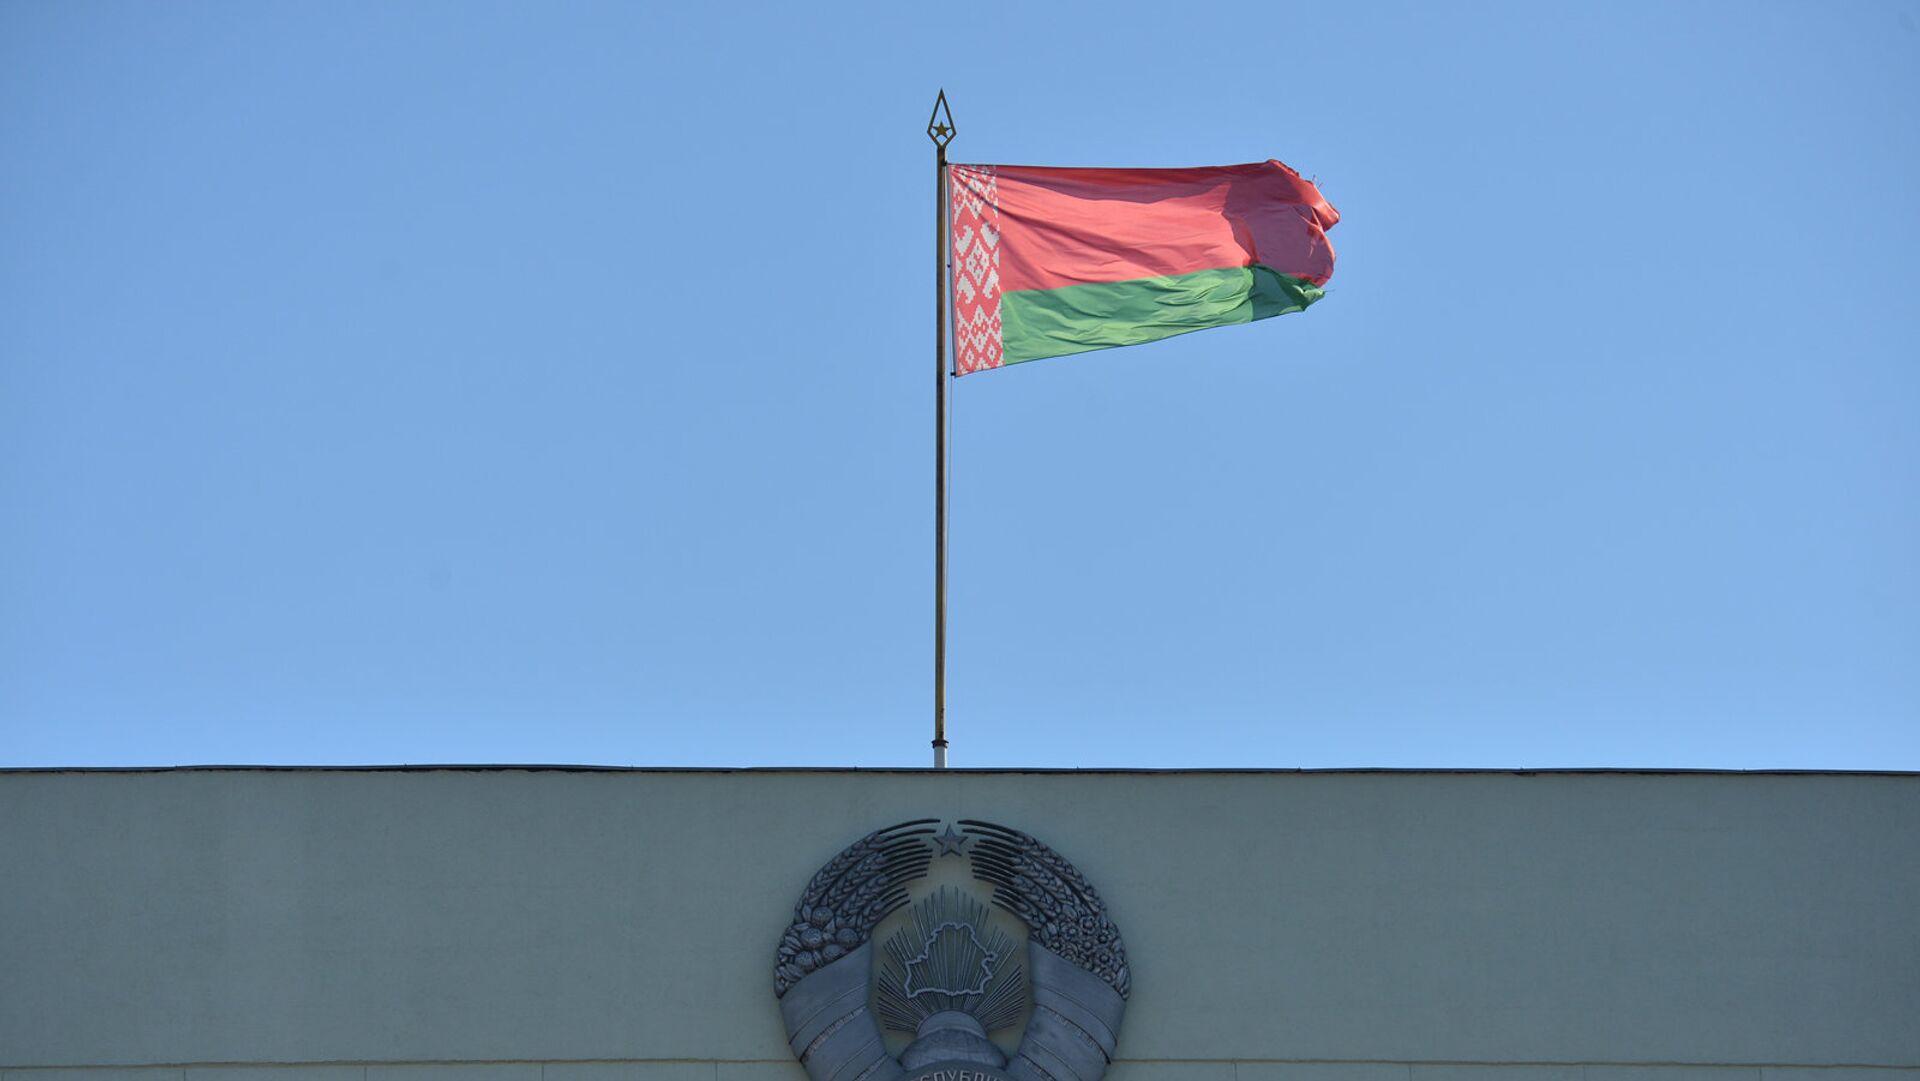 Герб и флаг Республики Беларусь - Sputnik Латвия, 1920, 09.06.2021